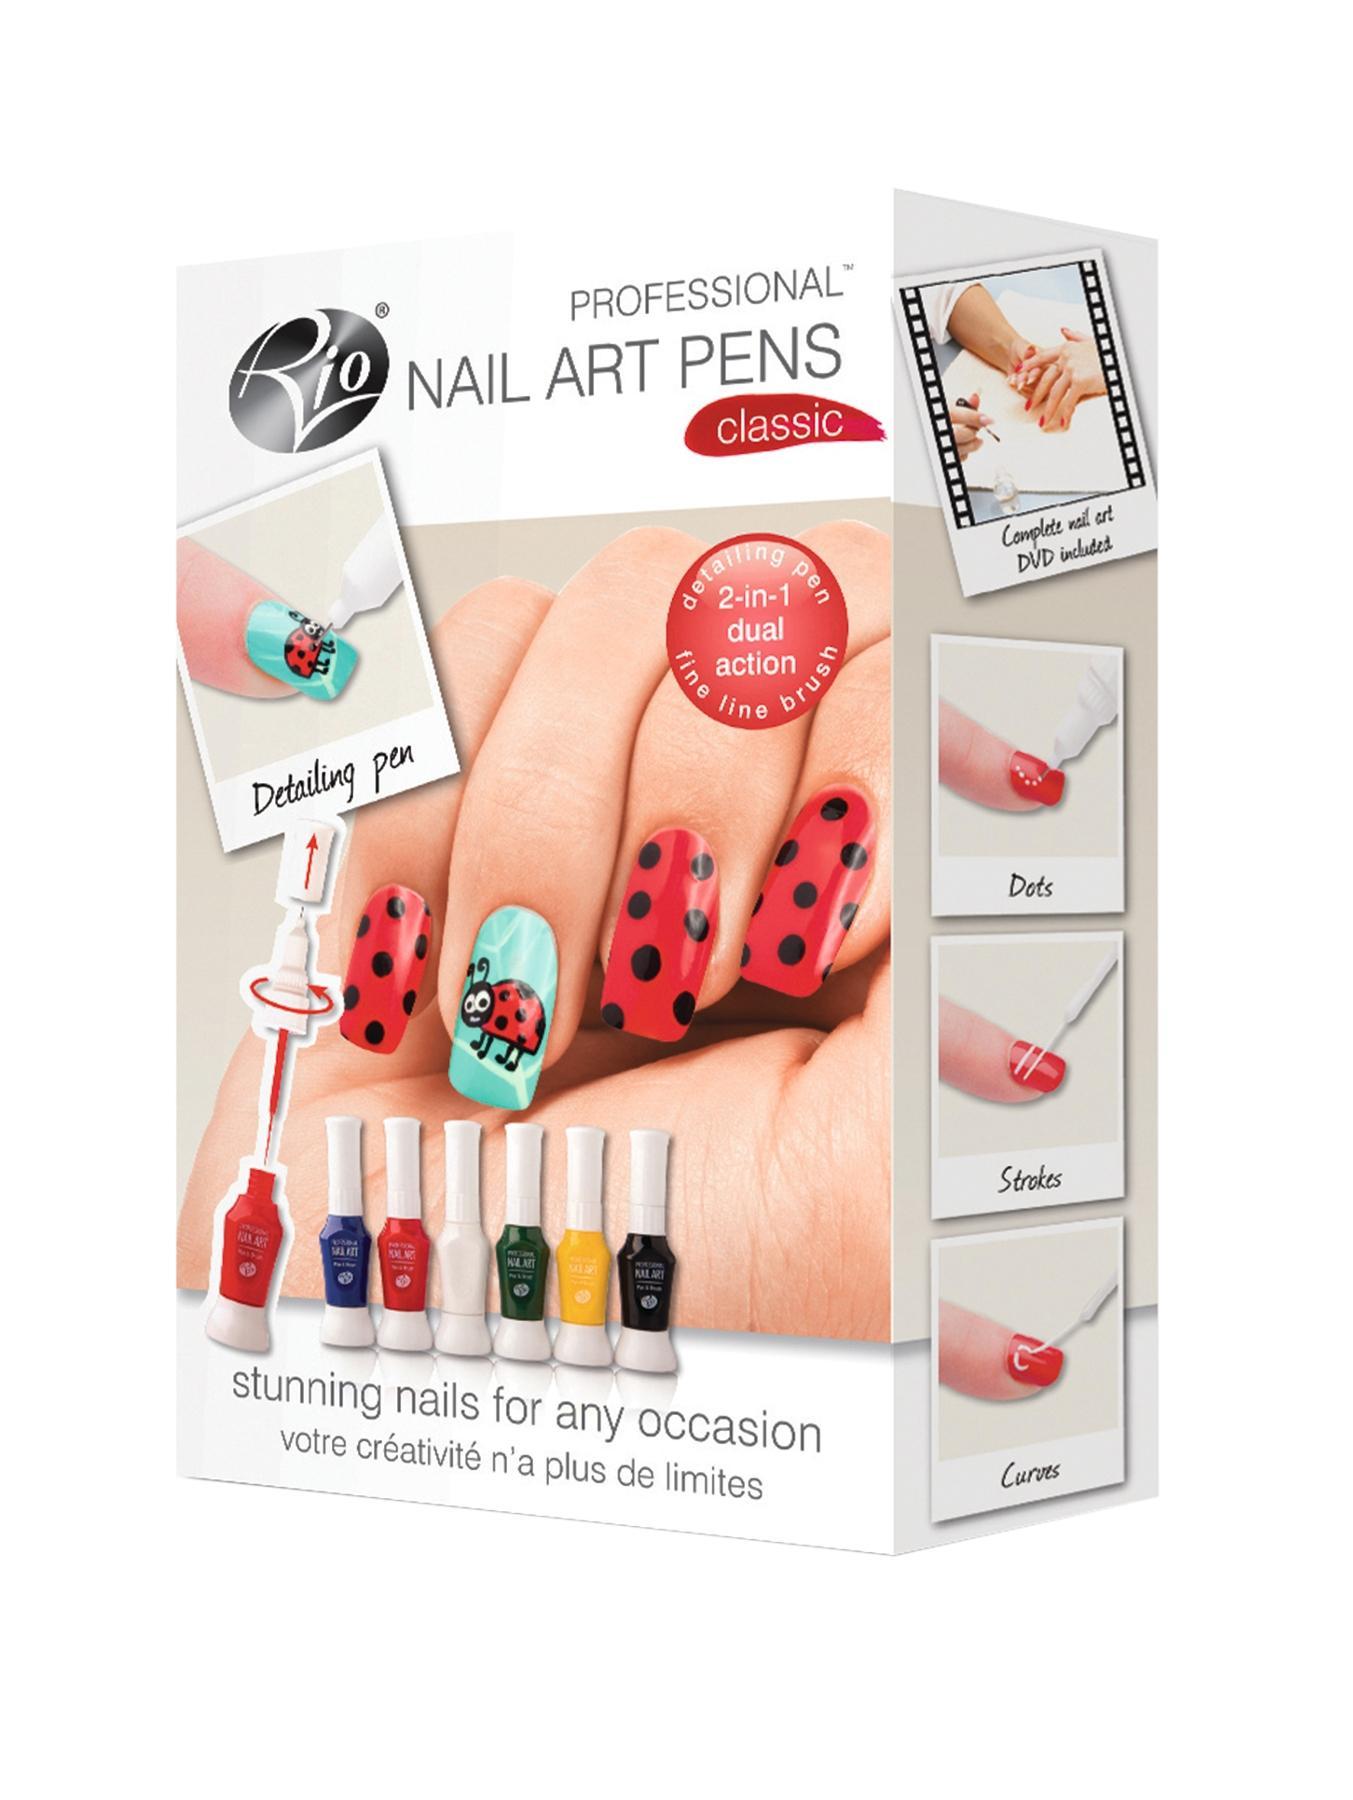 Professional Nail Art Pens - Classic